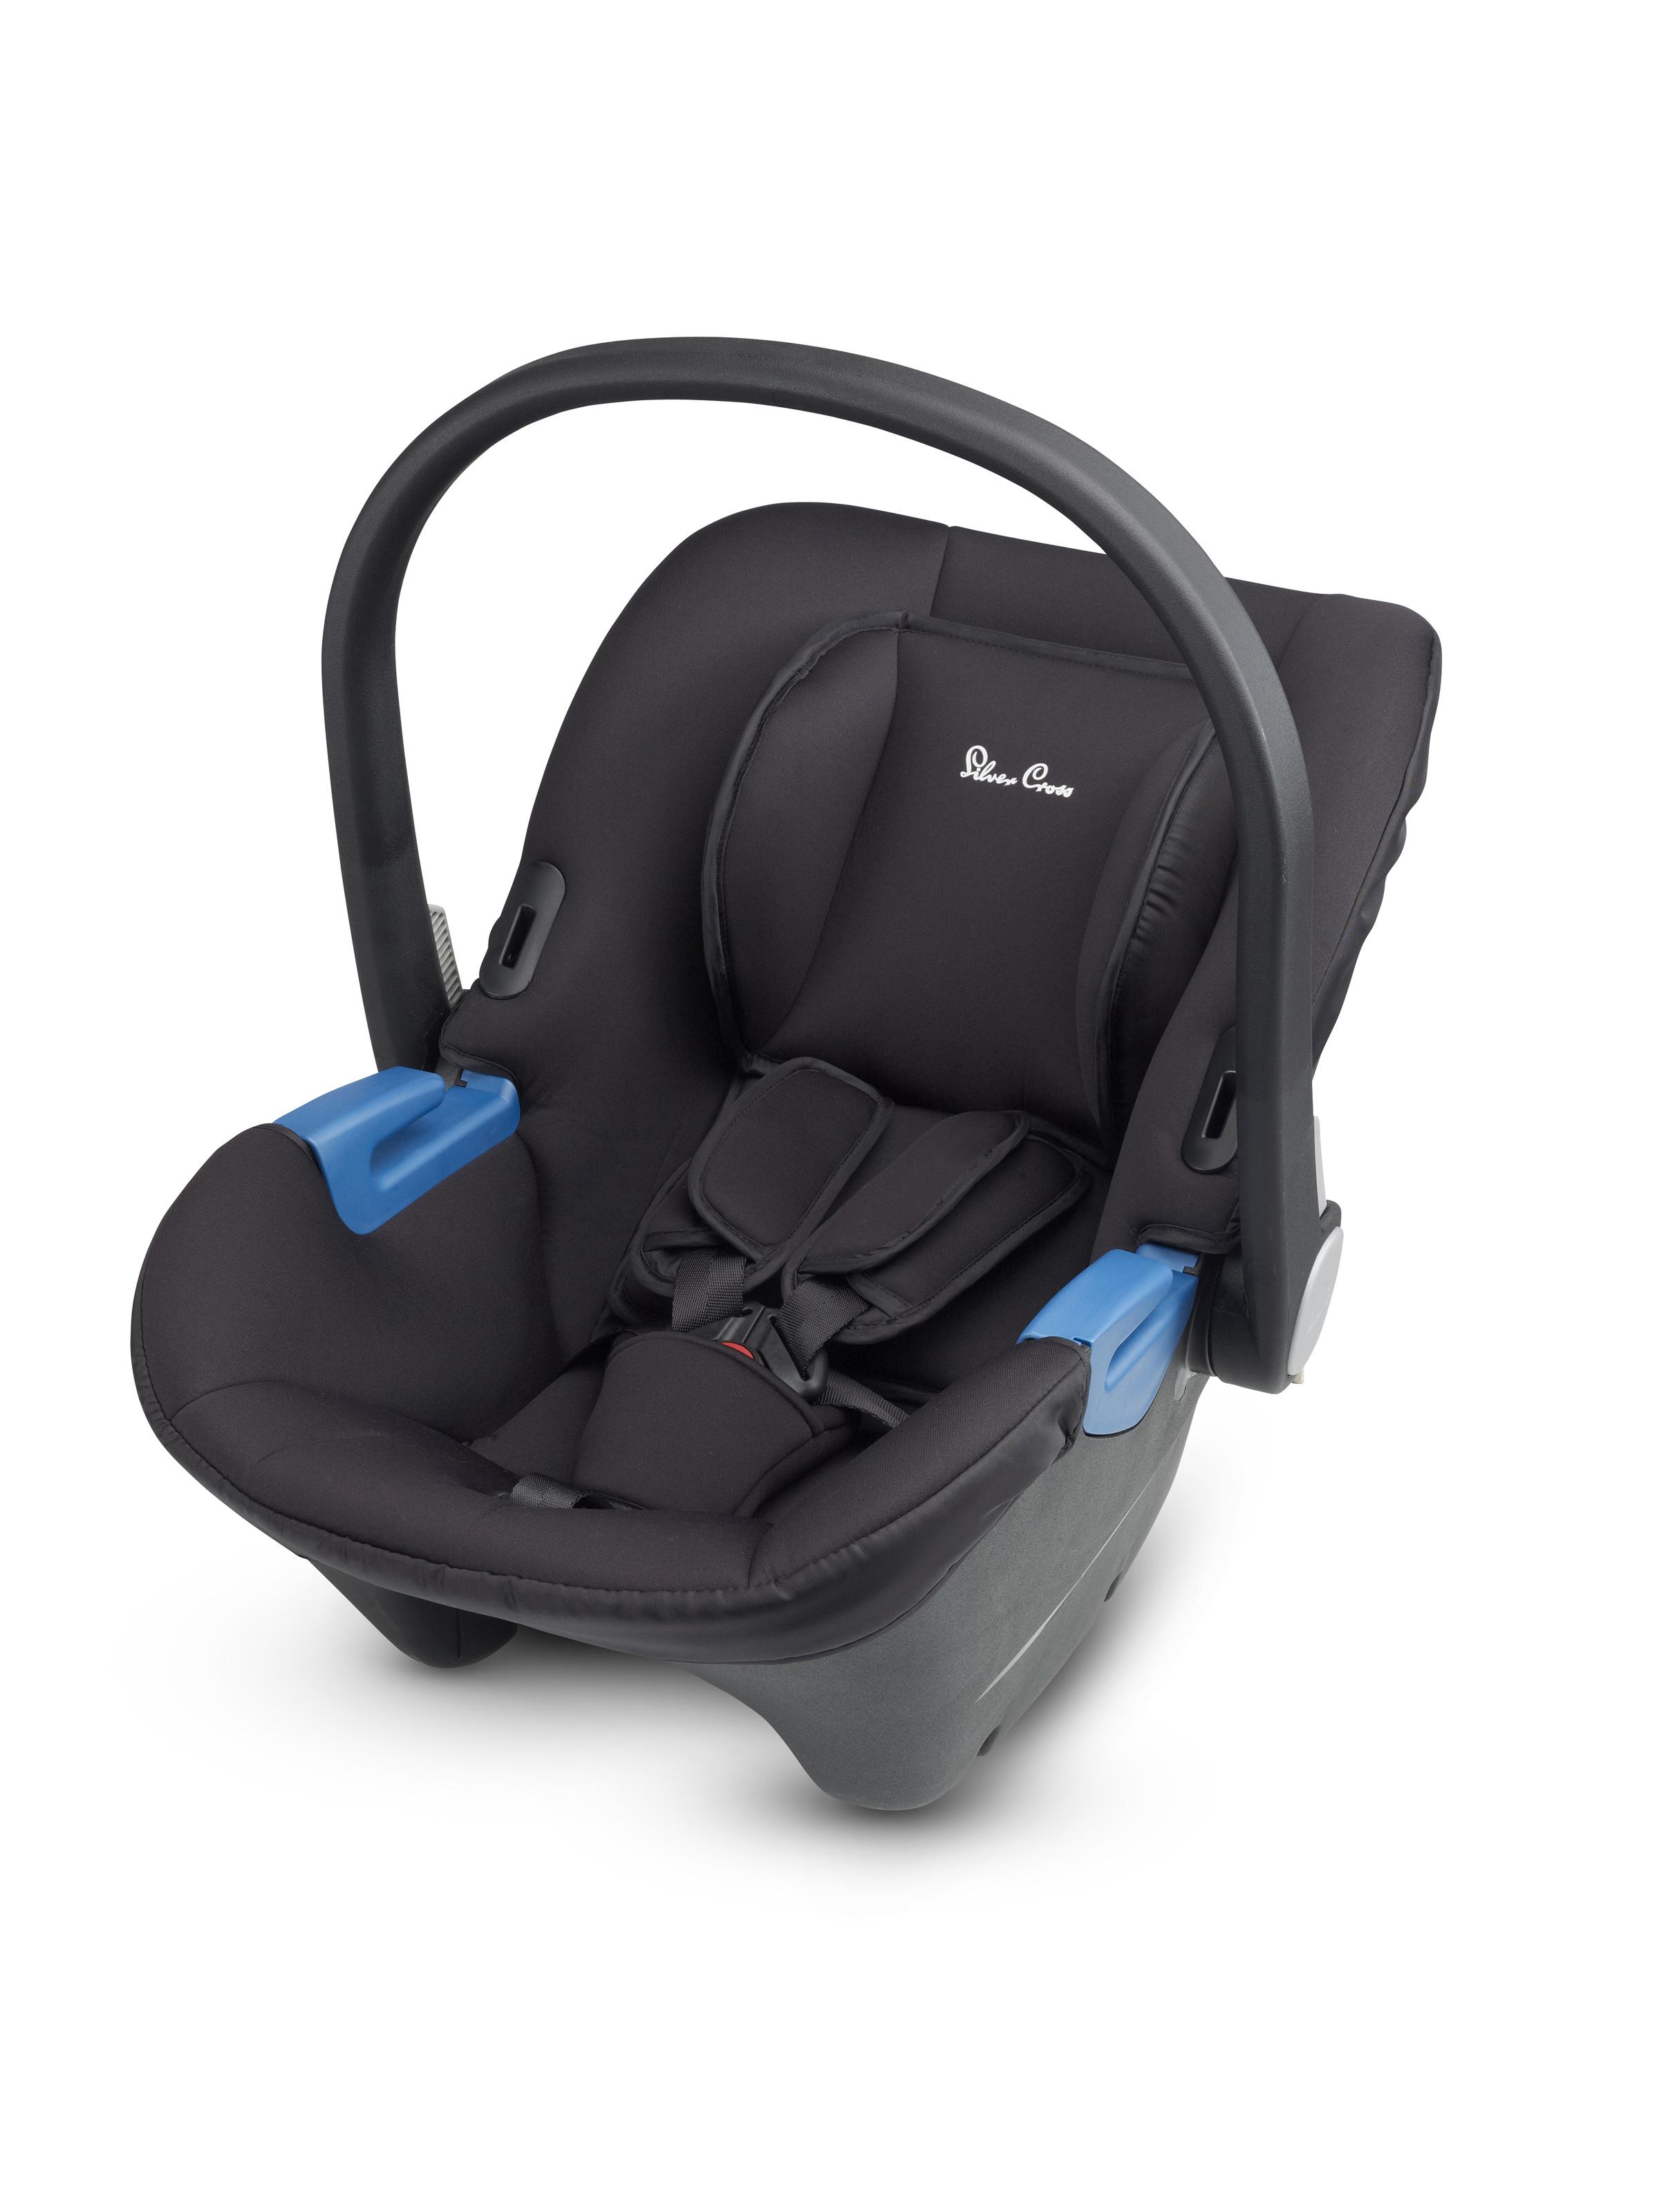 Silvercross Simplicity Car Seat Bambinos Wexford